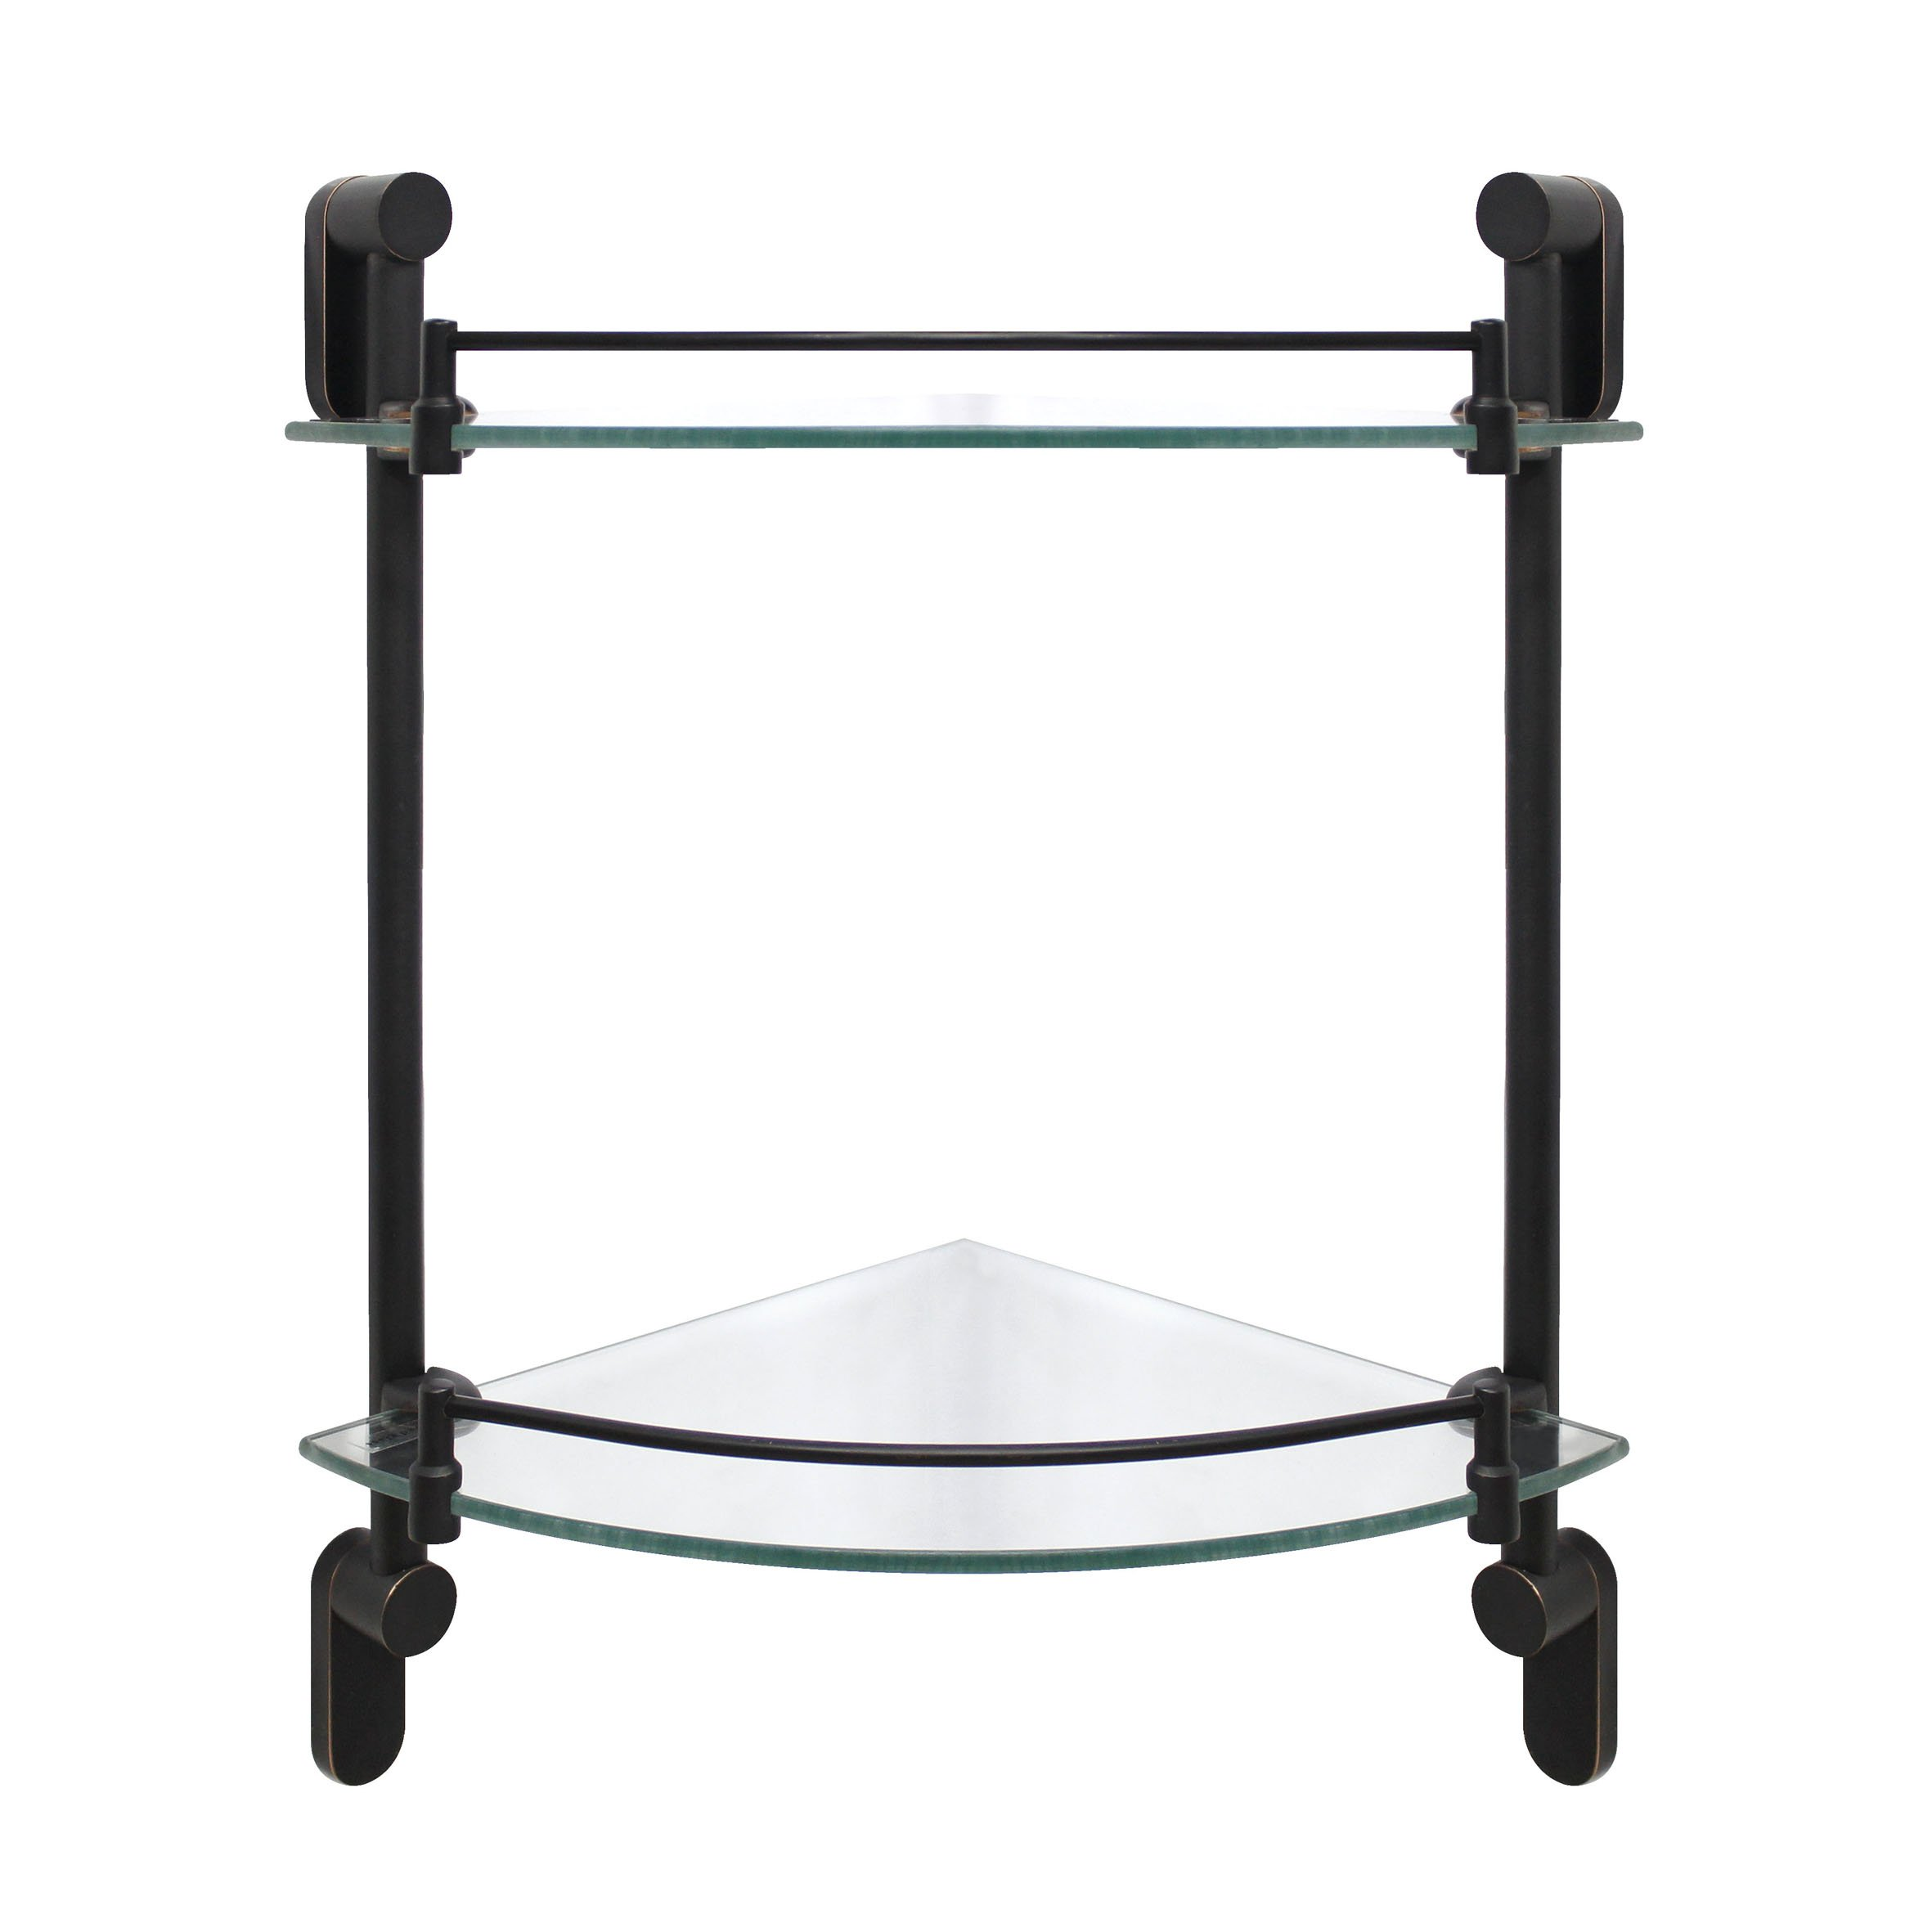 MODONA Double Corner Glass Shelf with Rail – Rubbed Bronze – Oval Series - 5 Year Warrantee